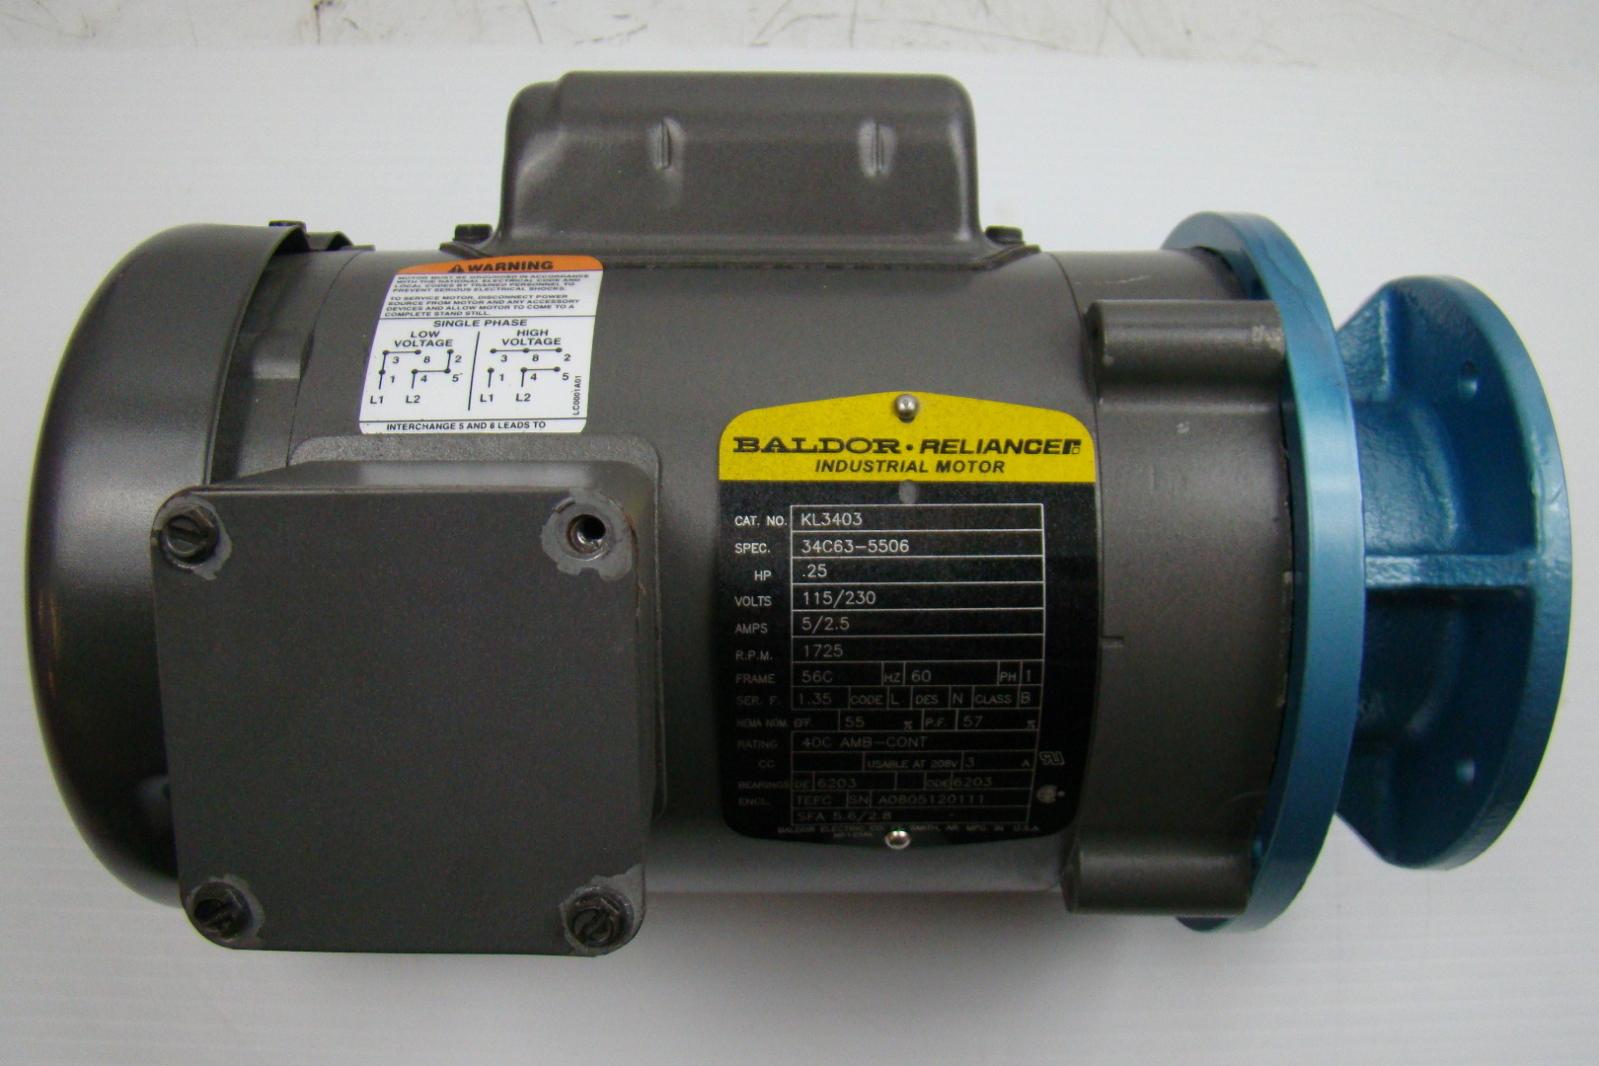 baldor single phase 230v motor wiring diagram mikuni carb parts reliance industrial 47